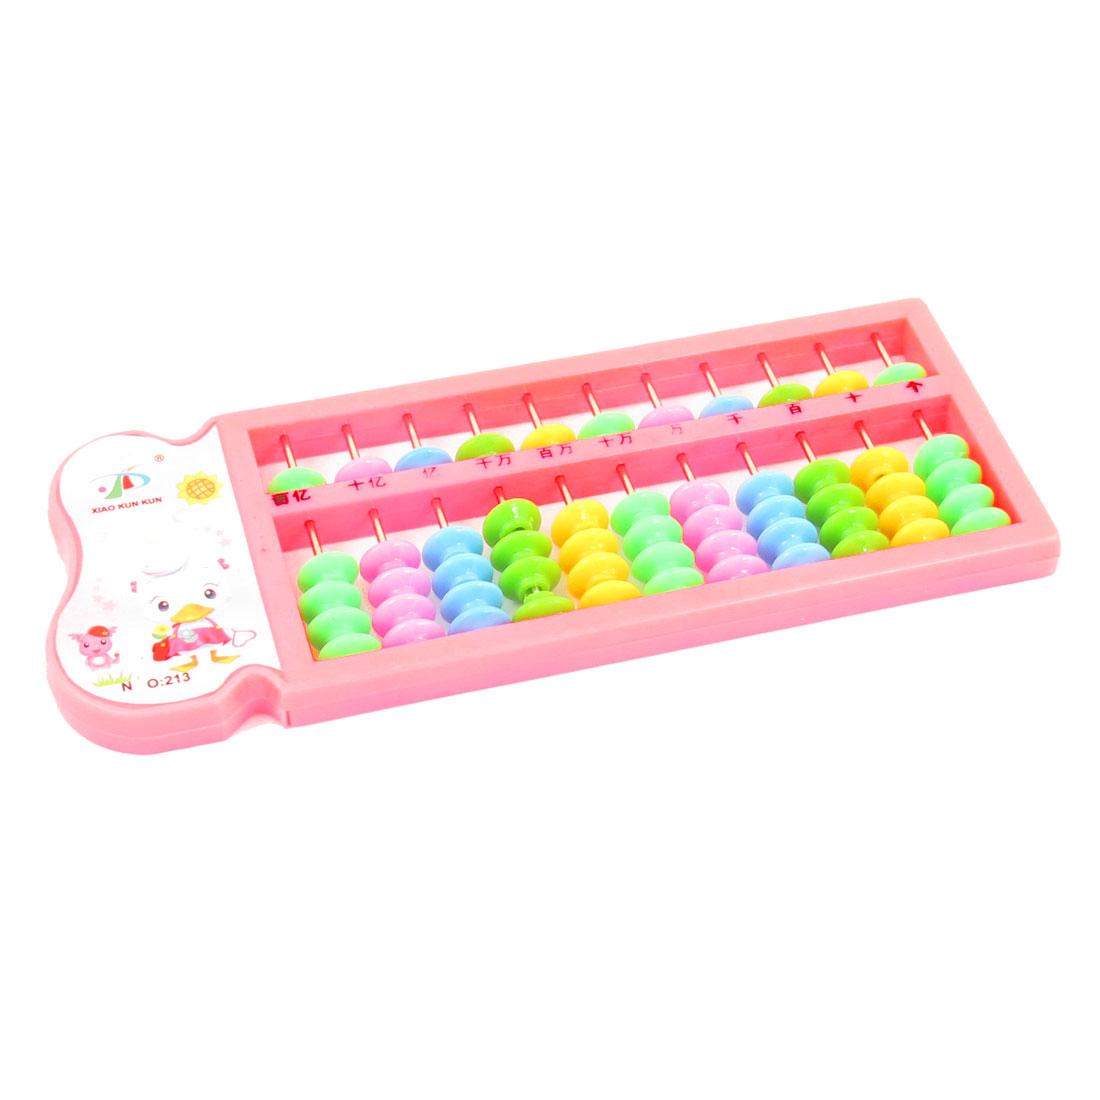 Education 55 Beaded 11 Rows Hot Pink Plastic Frame Mini Abacus Soroban